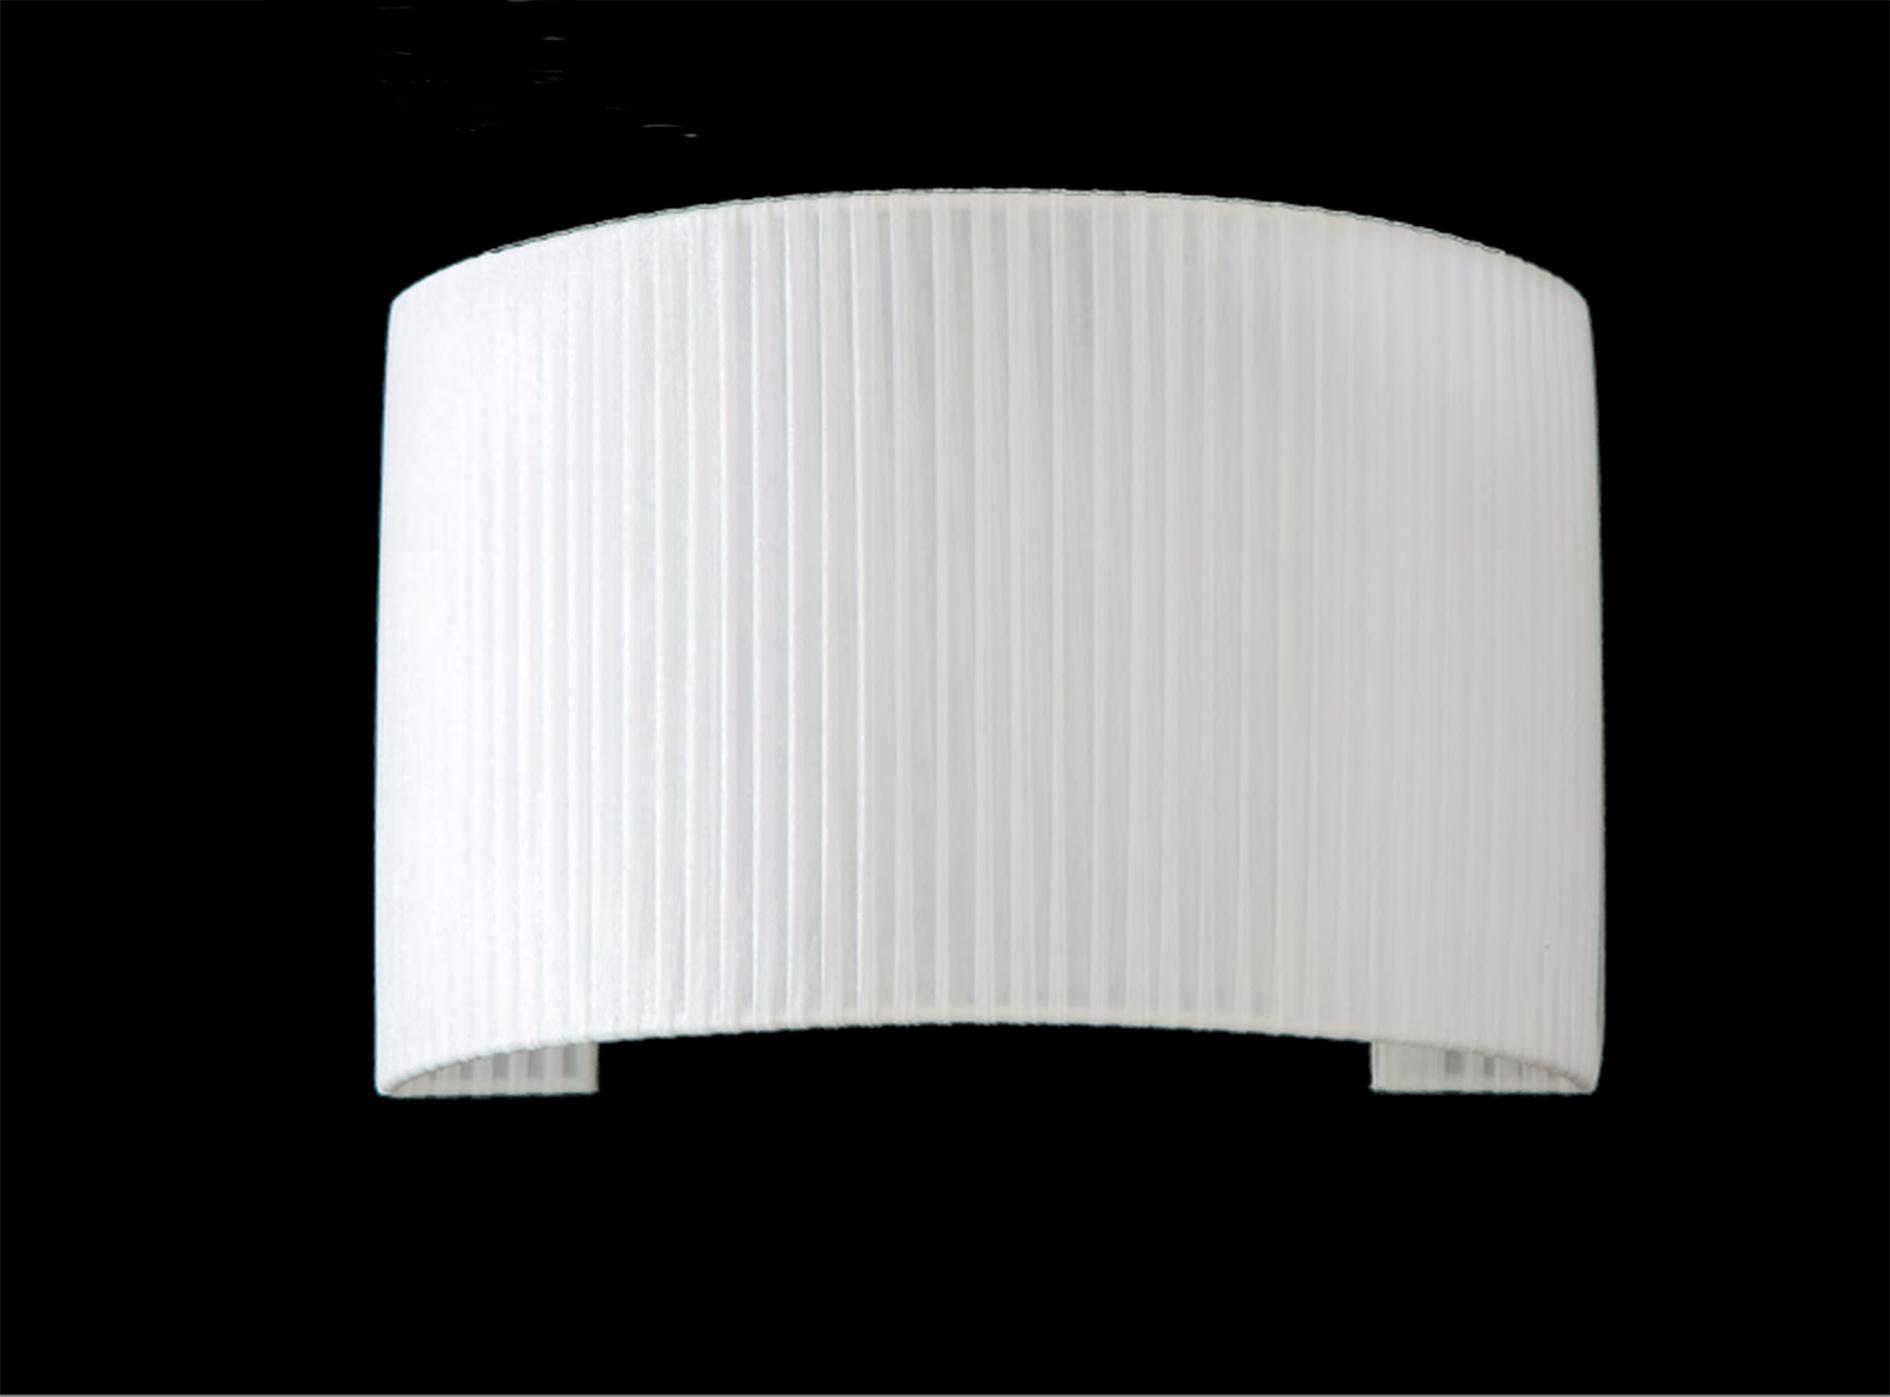 Padana lampadari lampada da parete athena 1035/a bi   notali lampadari